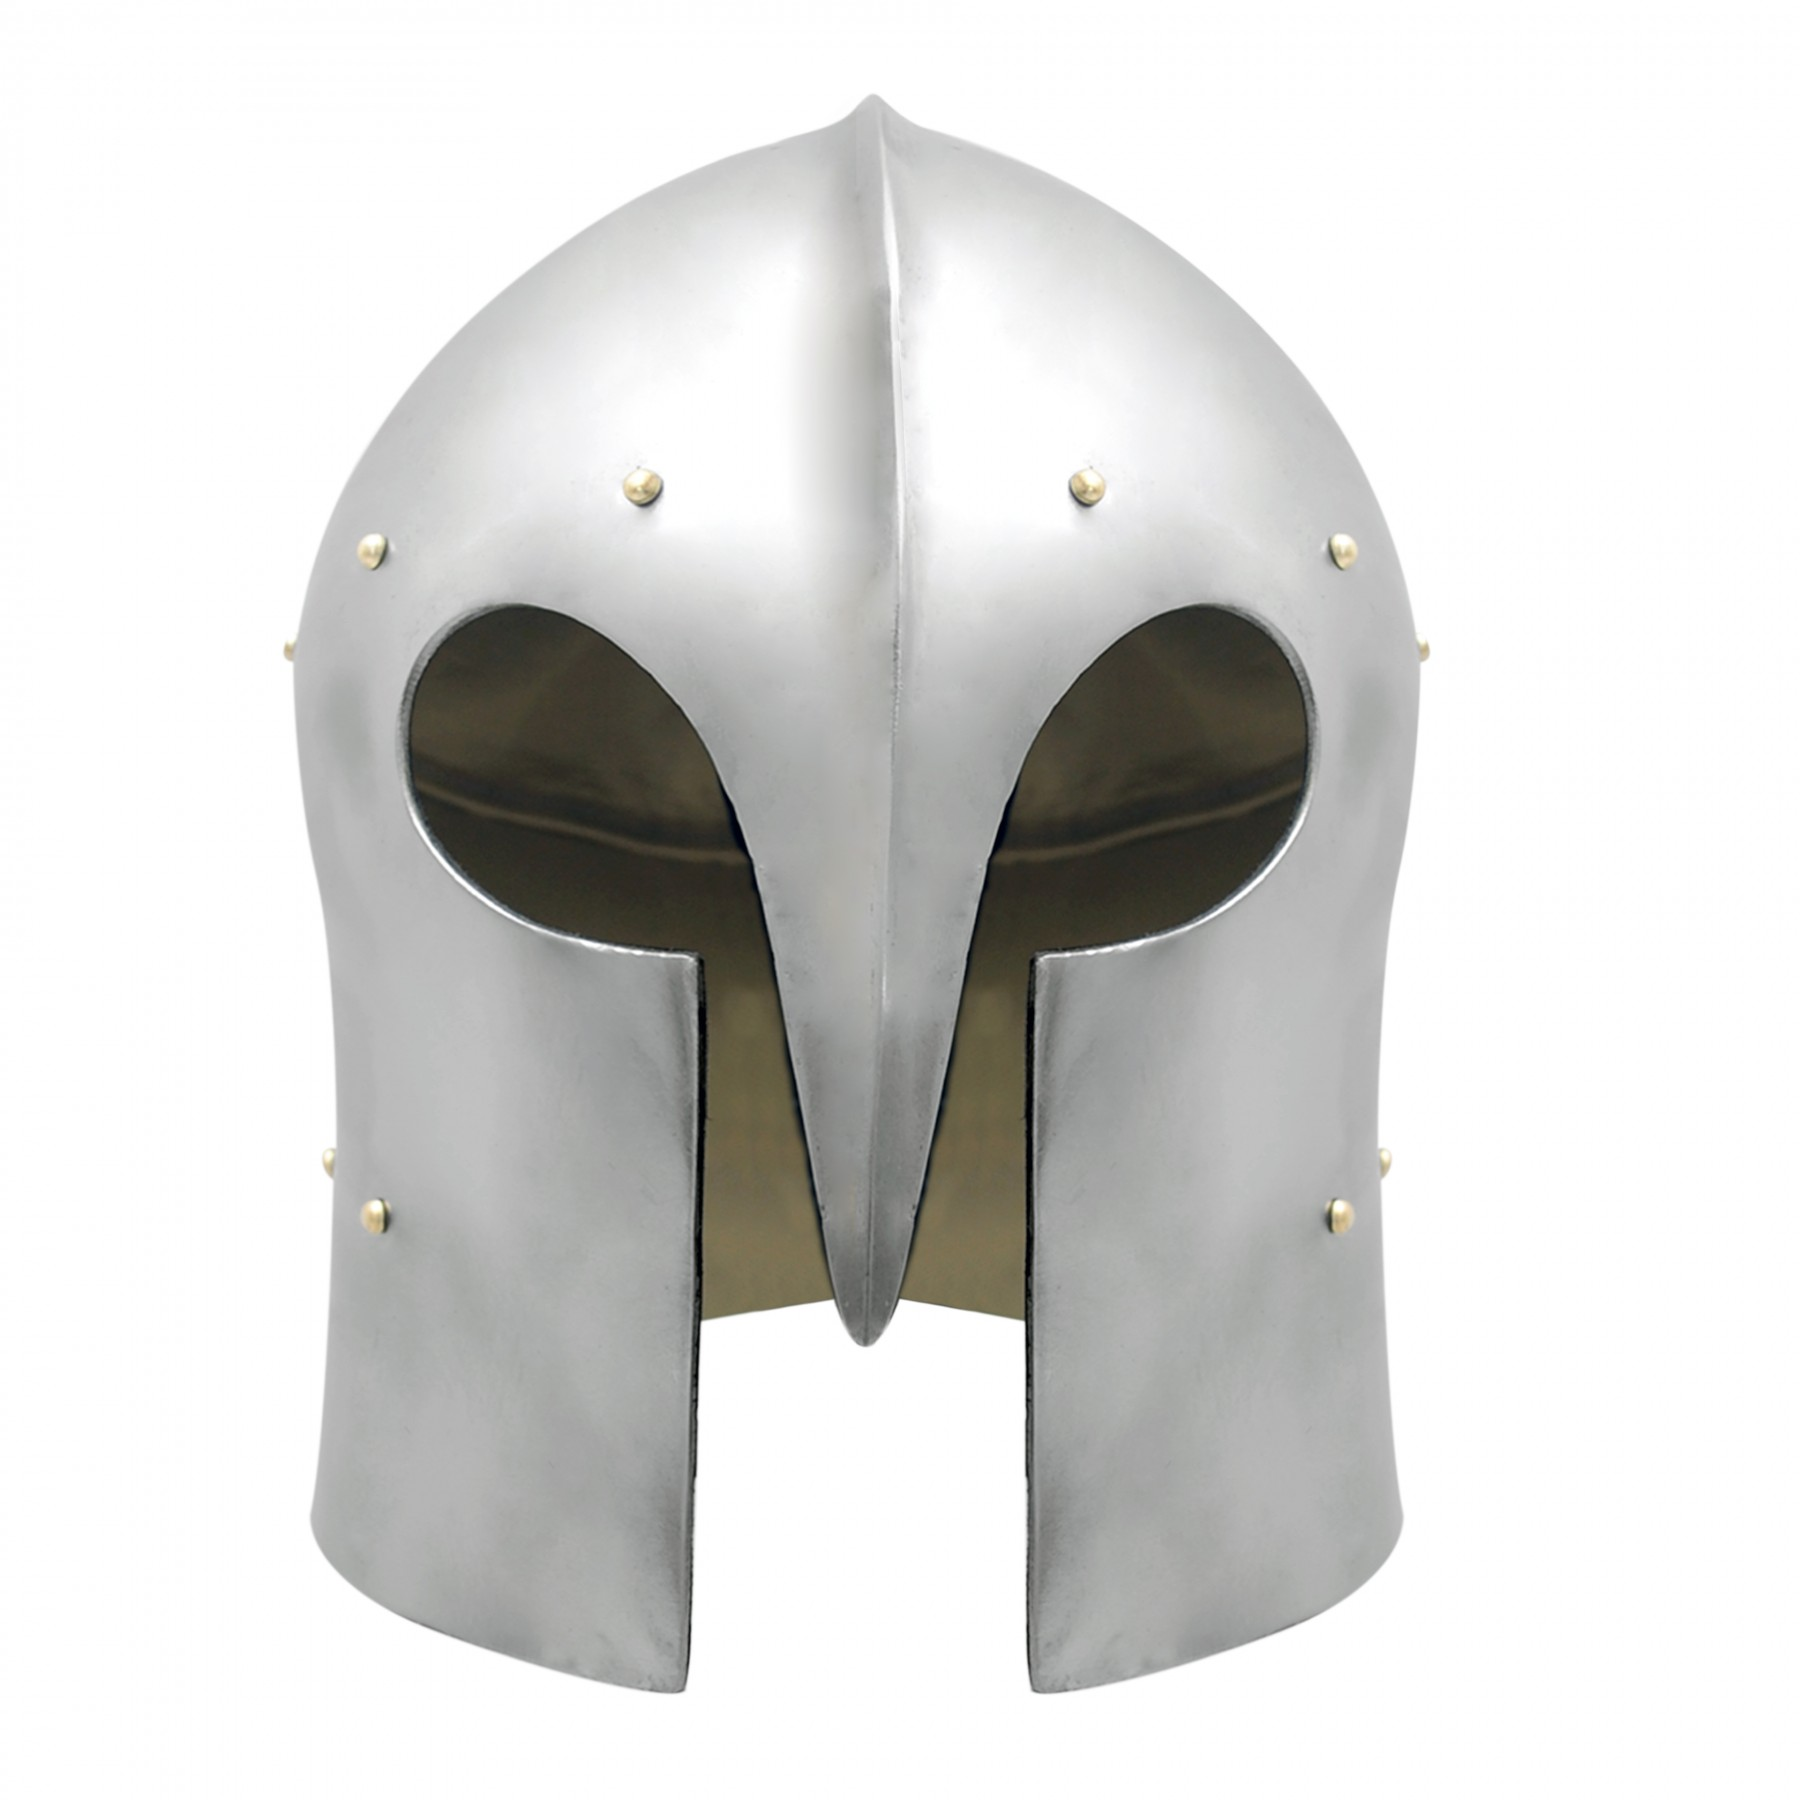 Corinthian Barbute helmet